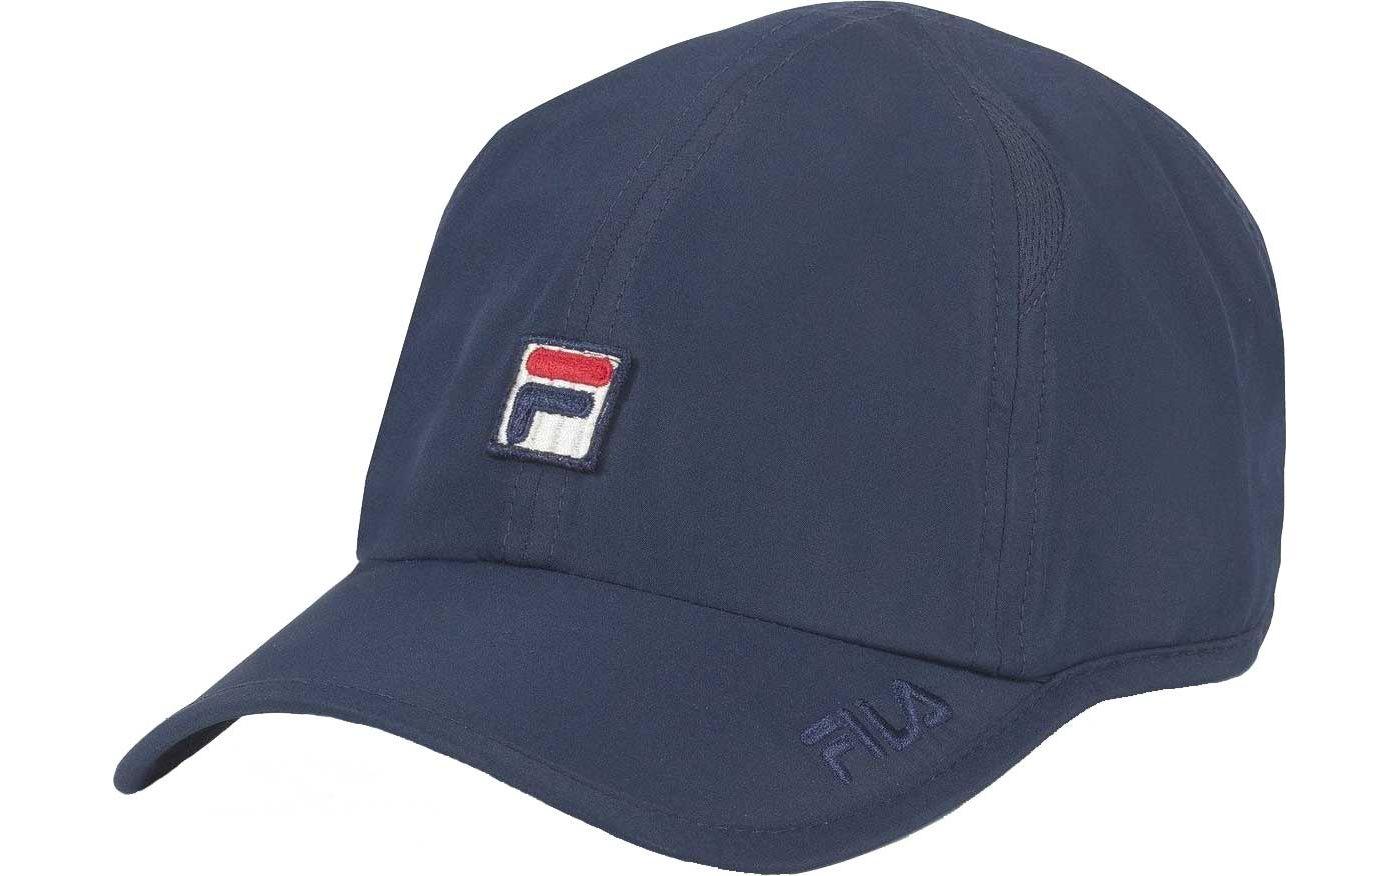 Fila Performance Solid Tennis Hat